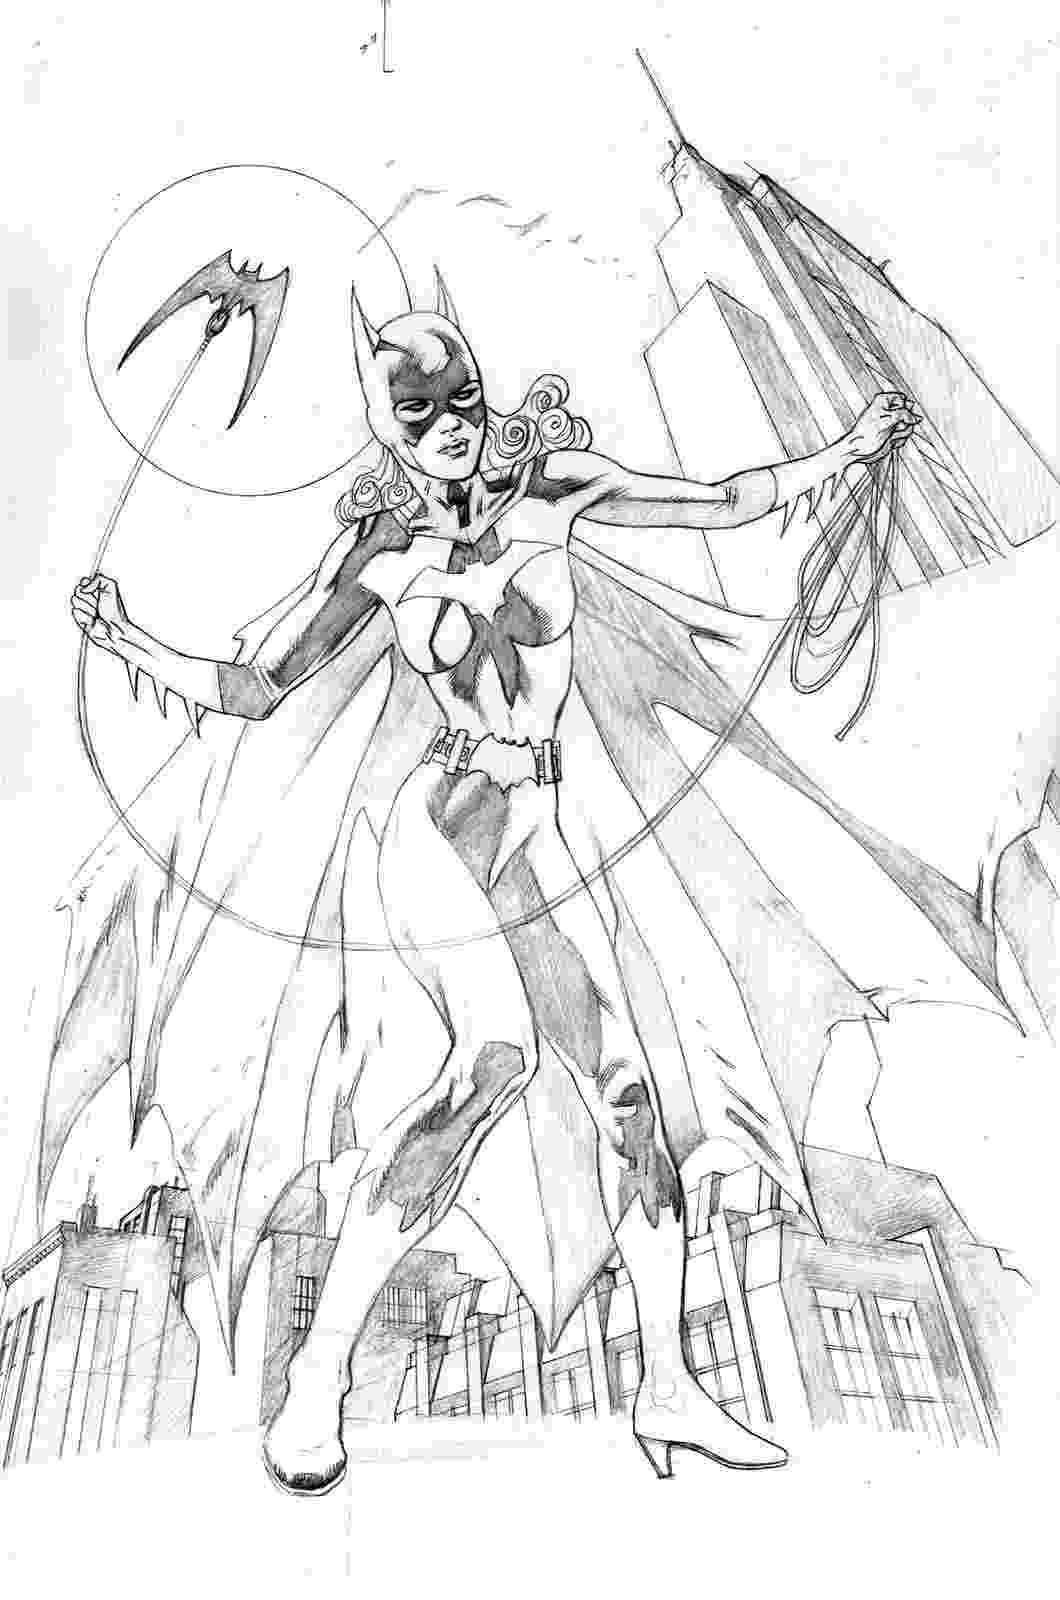 batgirl coloring page free printable batgirl coloring pages for kids page coloring batgirl